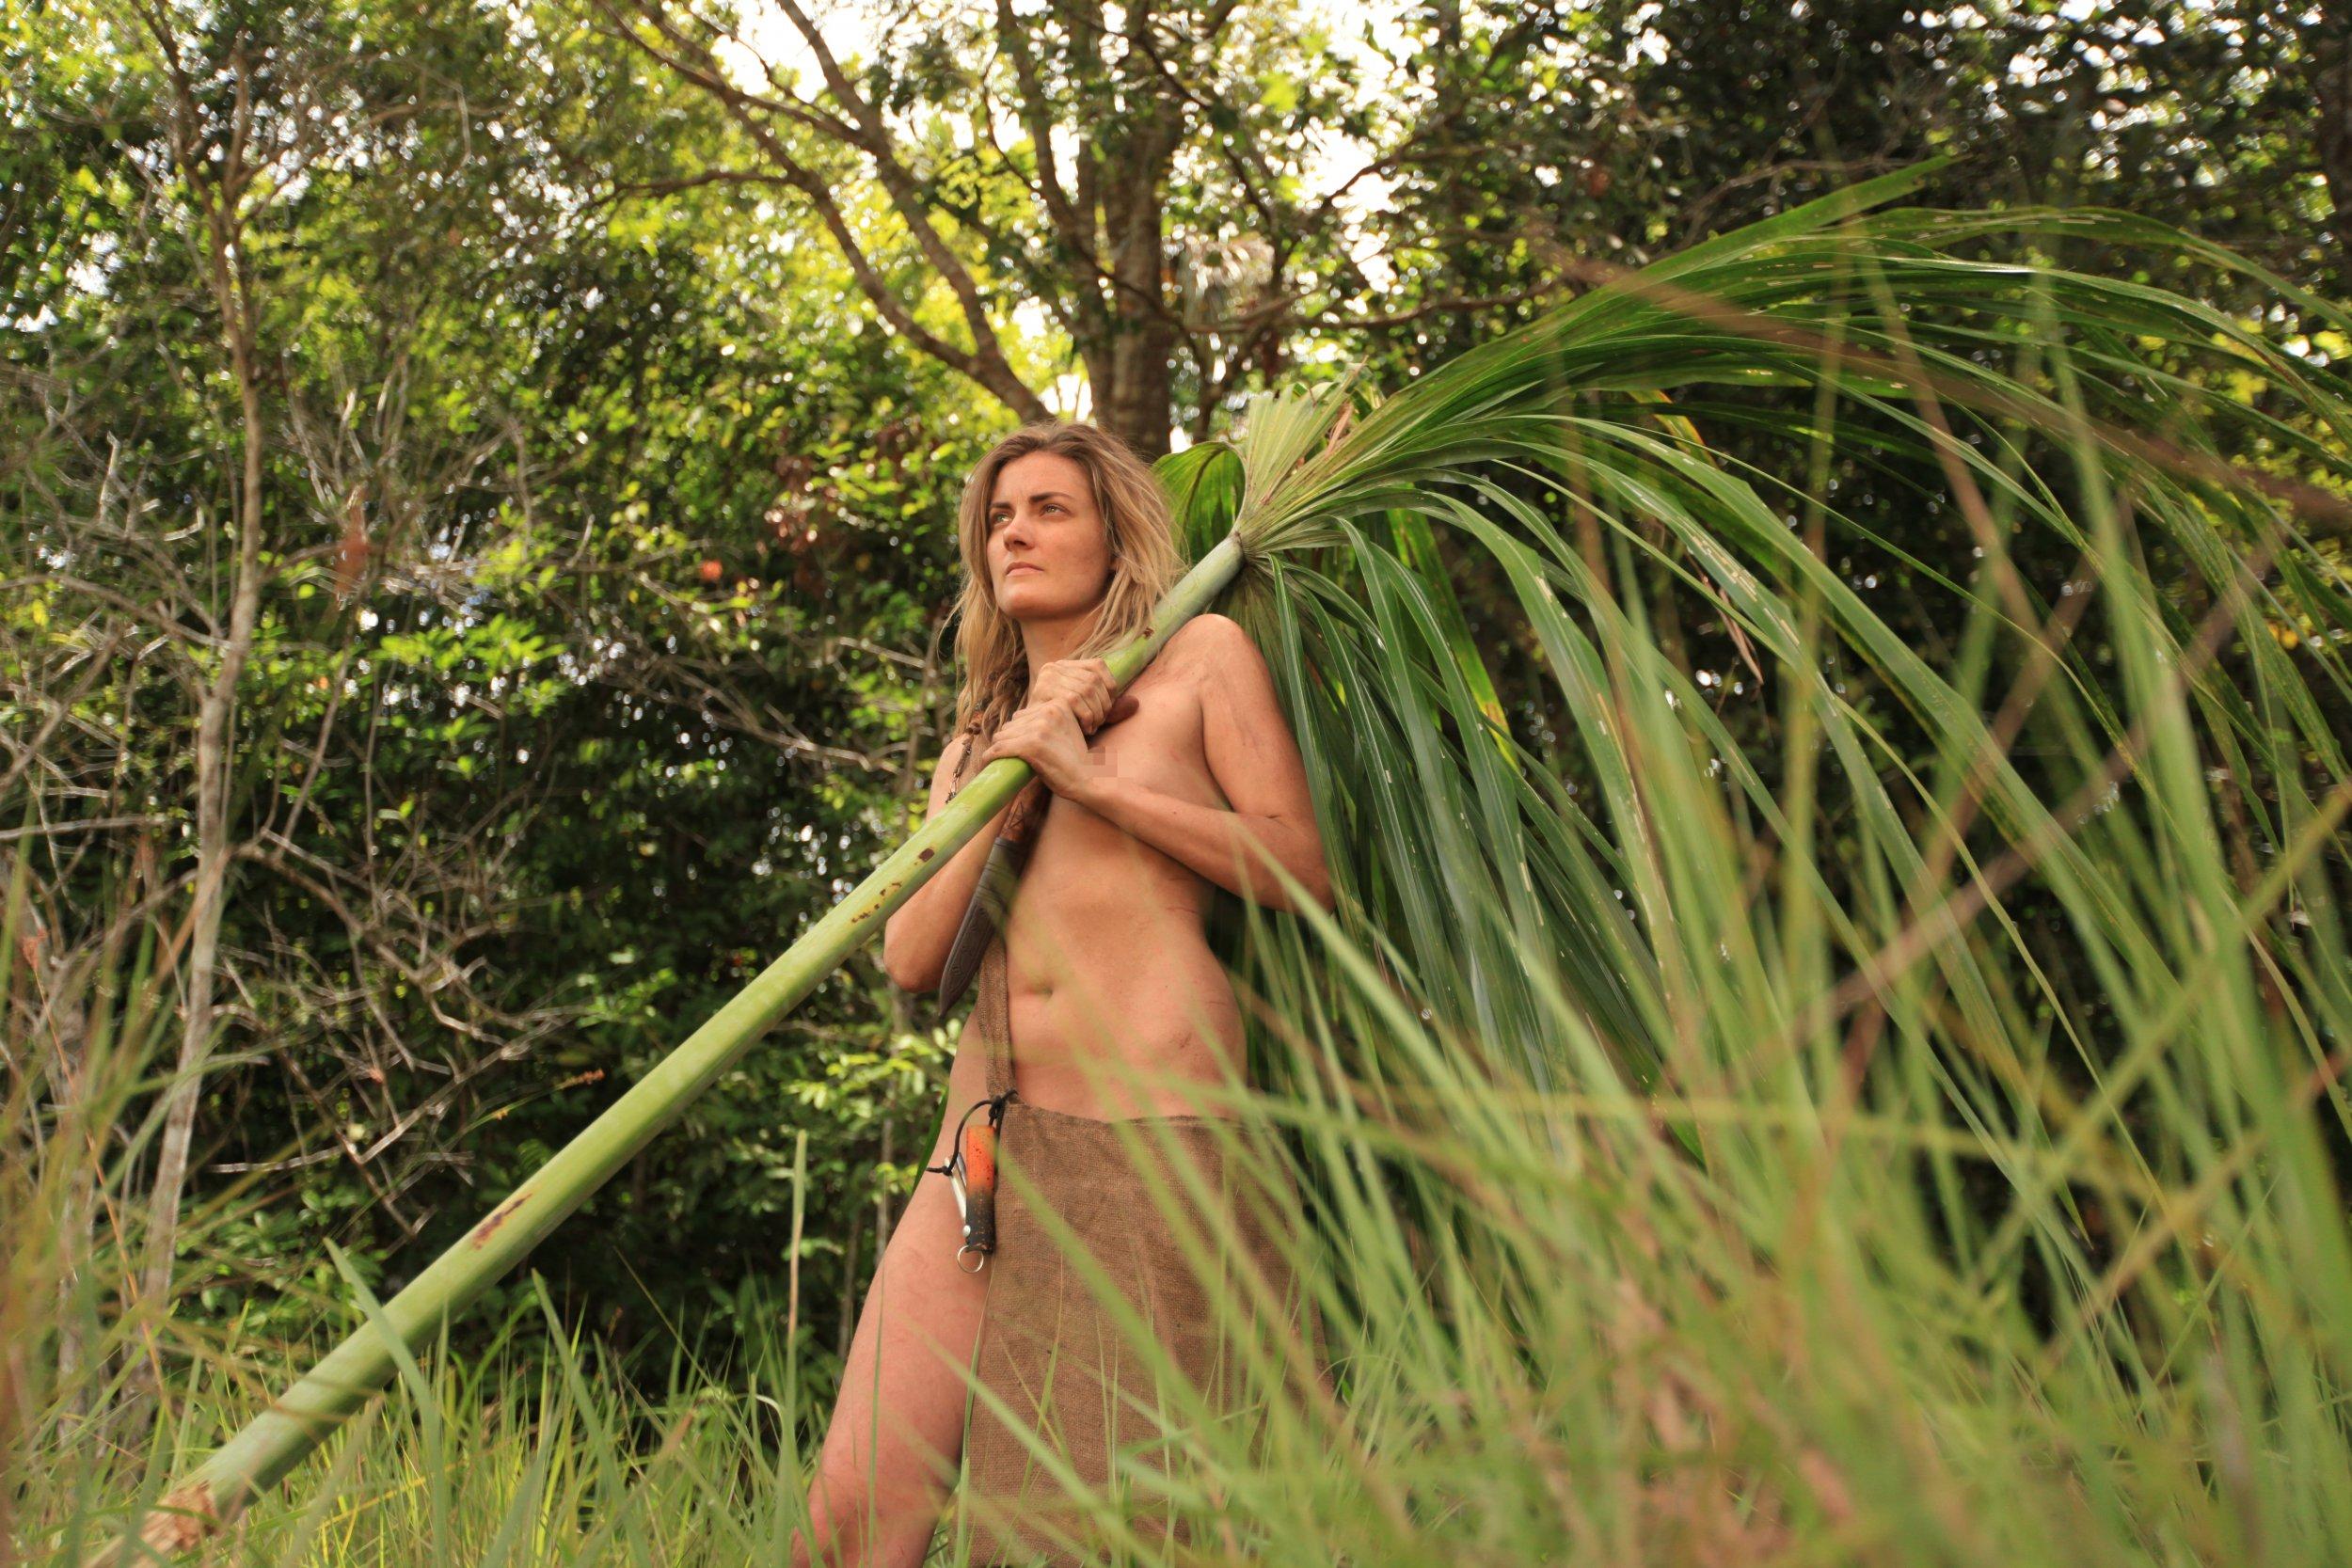 nude flickr babes selfies